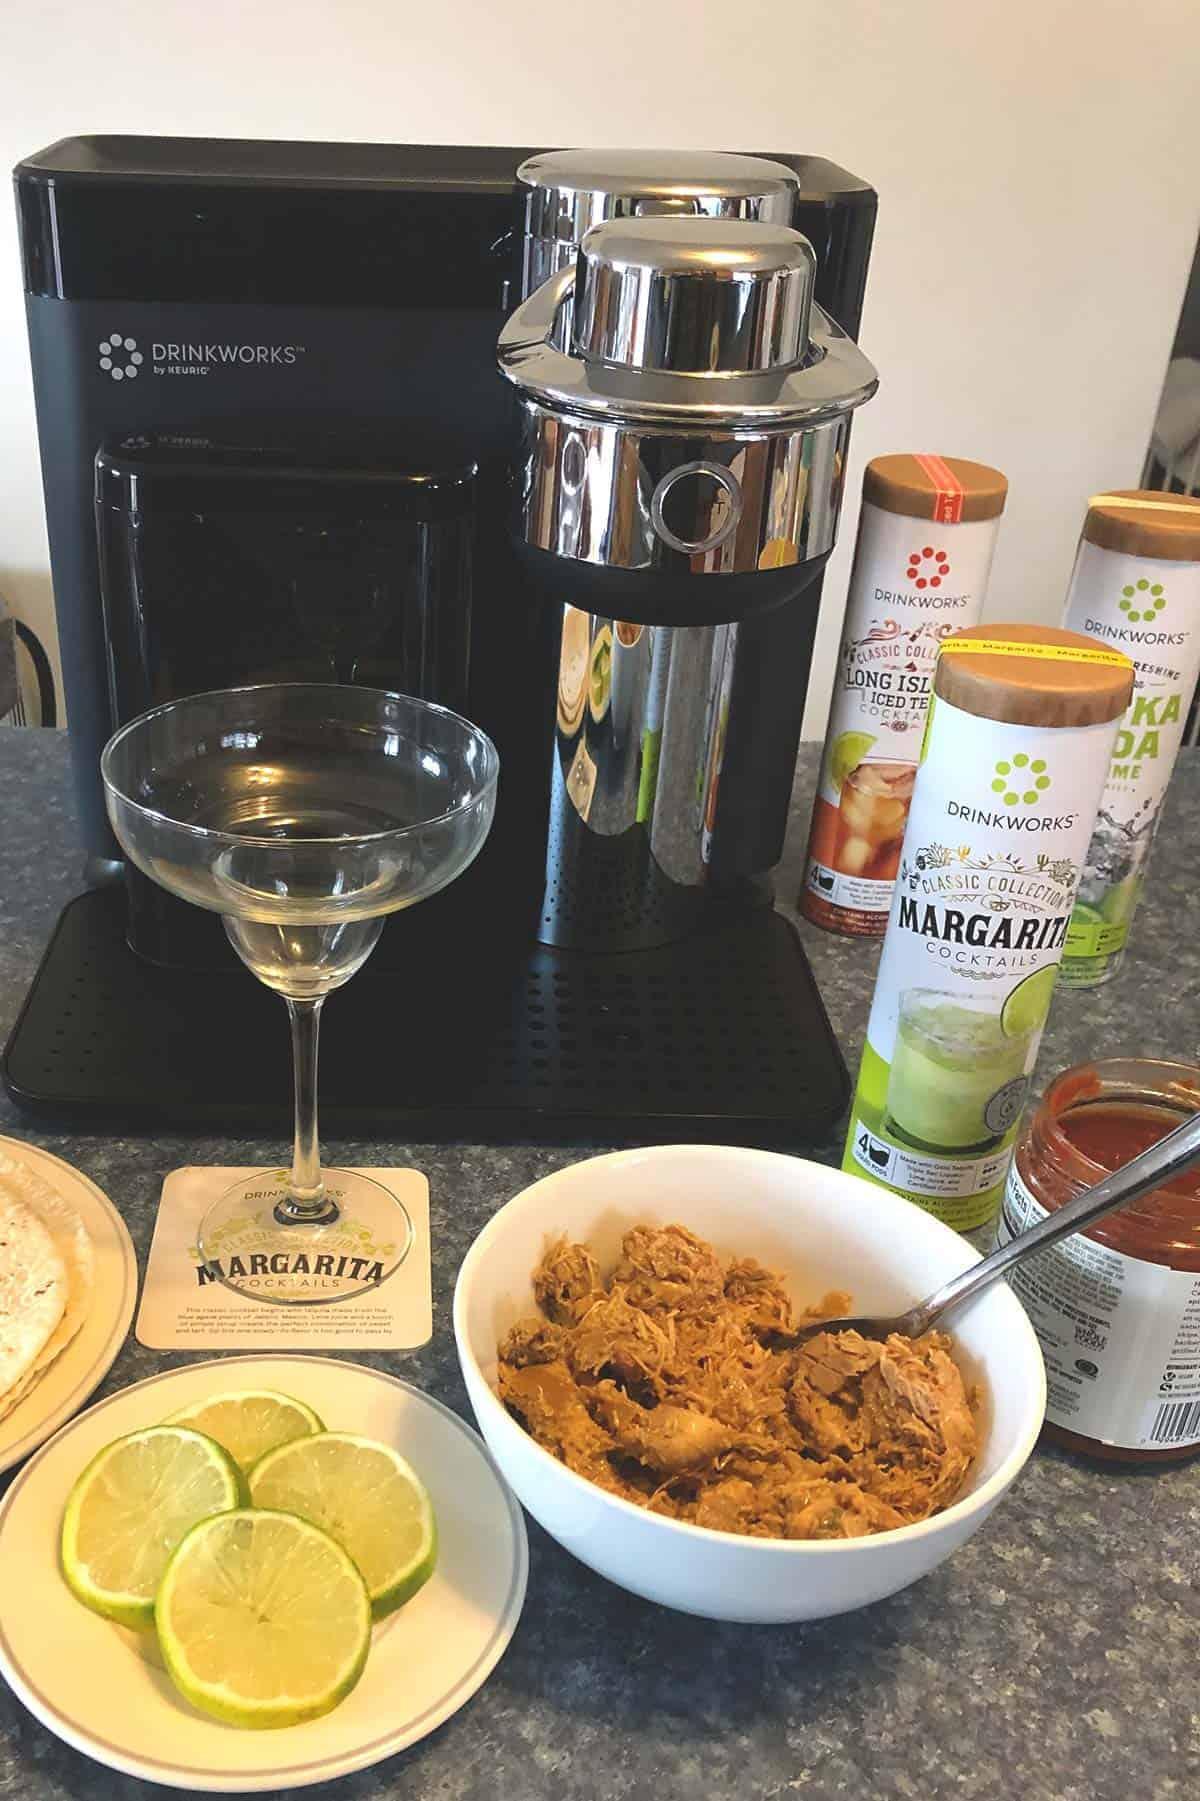 Drinkworks Home Bar set up to make margaritas for taco night.